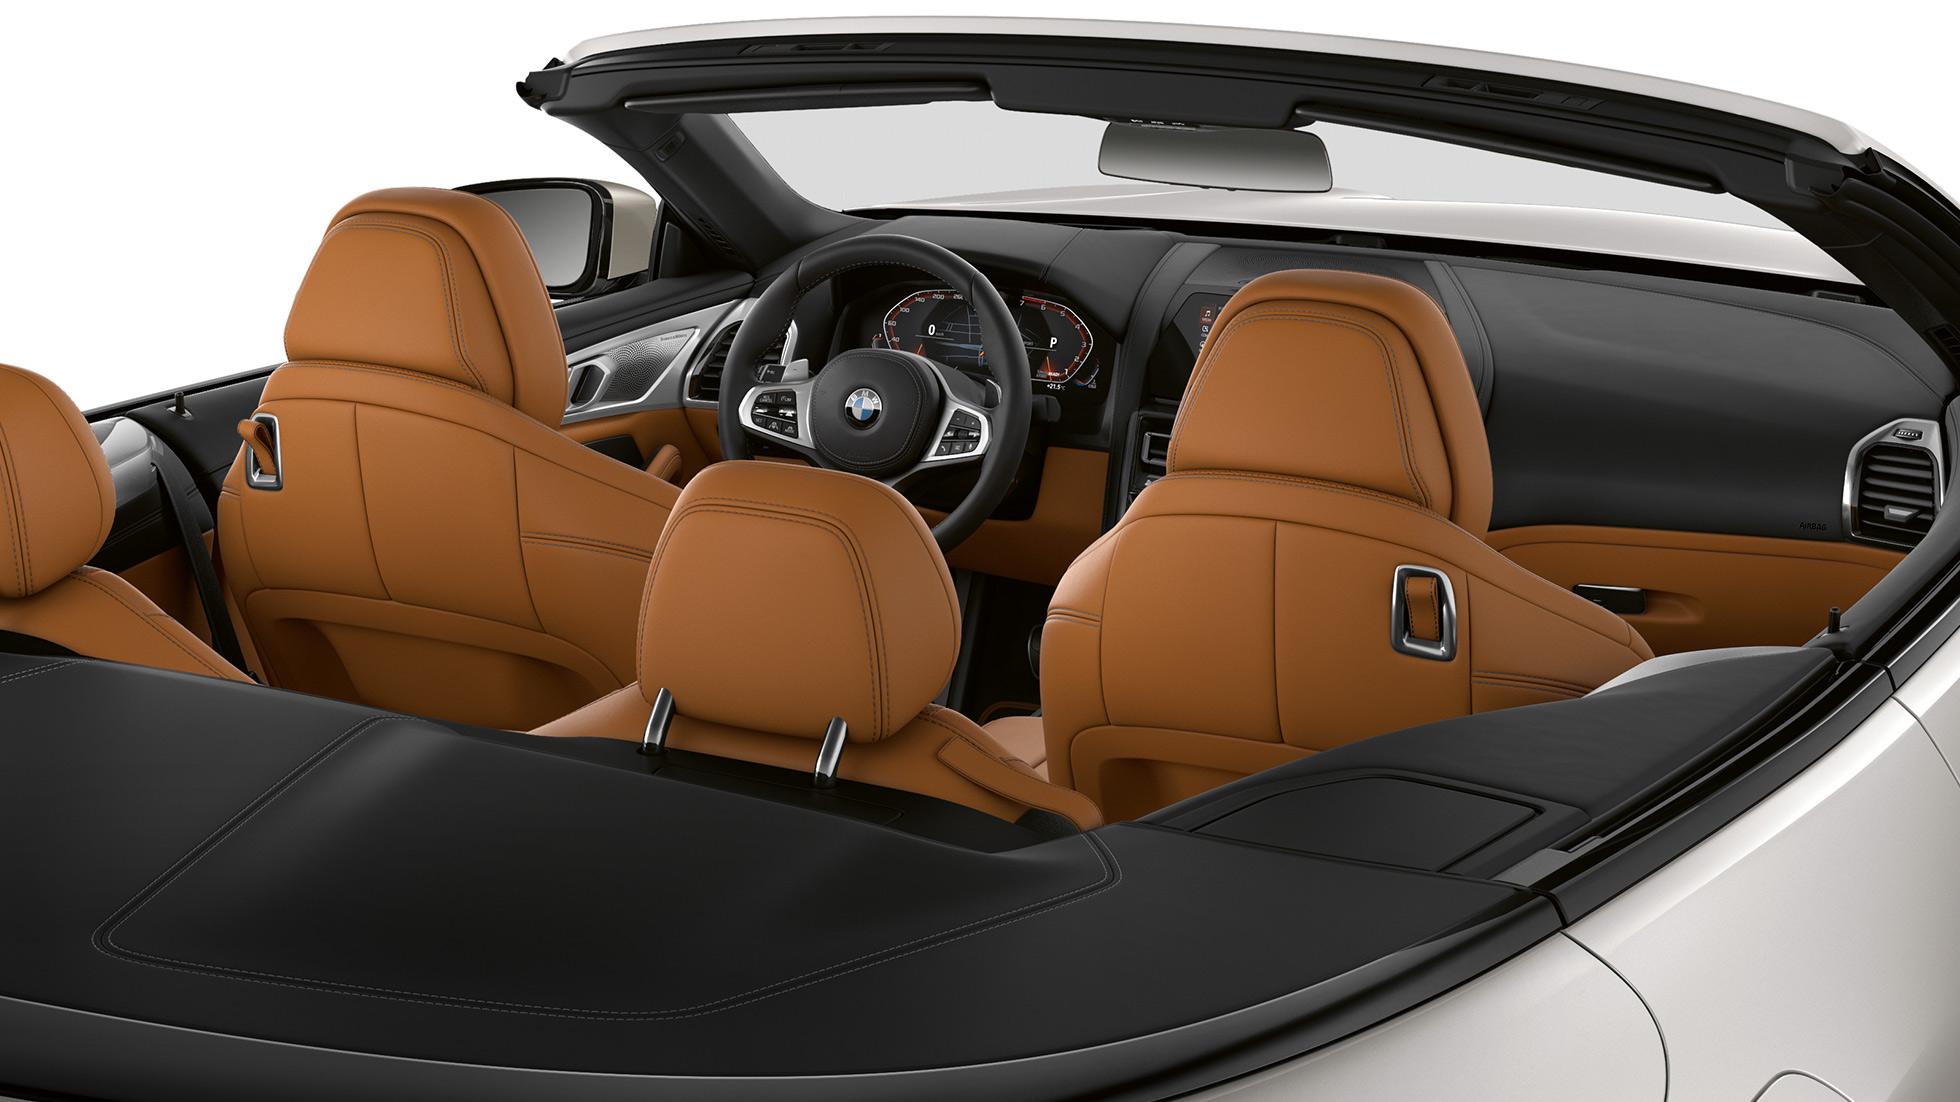 BMW M850i xDrive, интерьер, мягкий верх опущен.